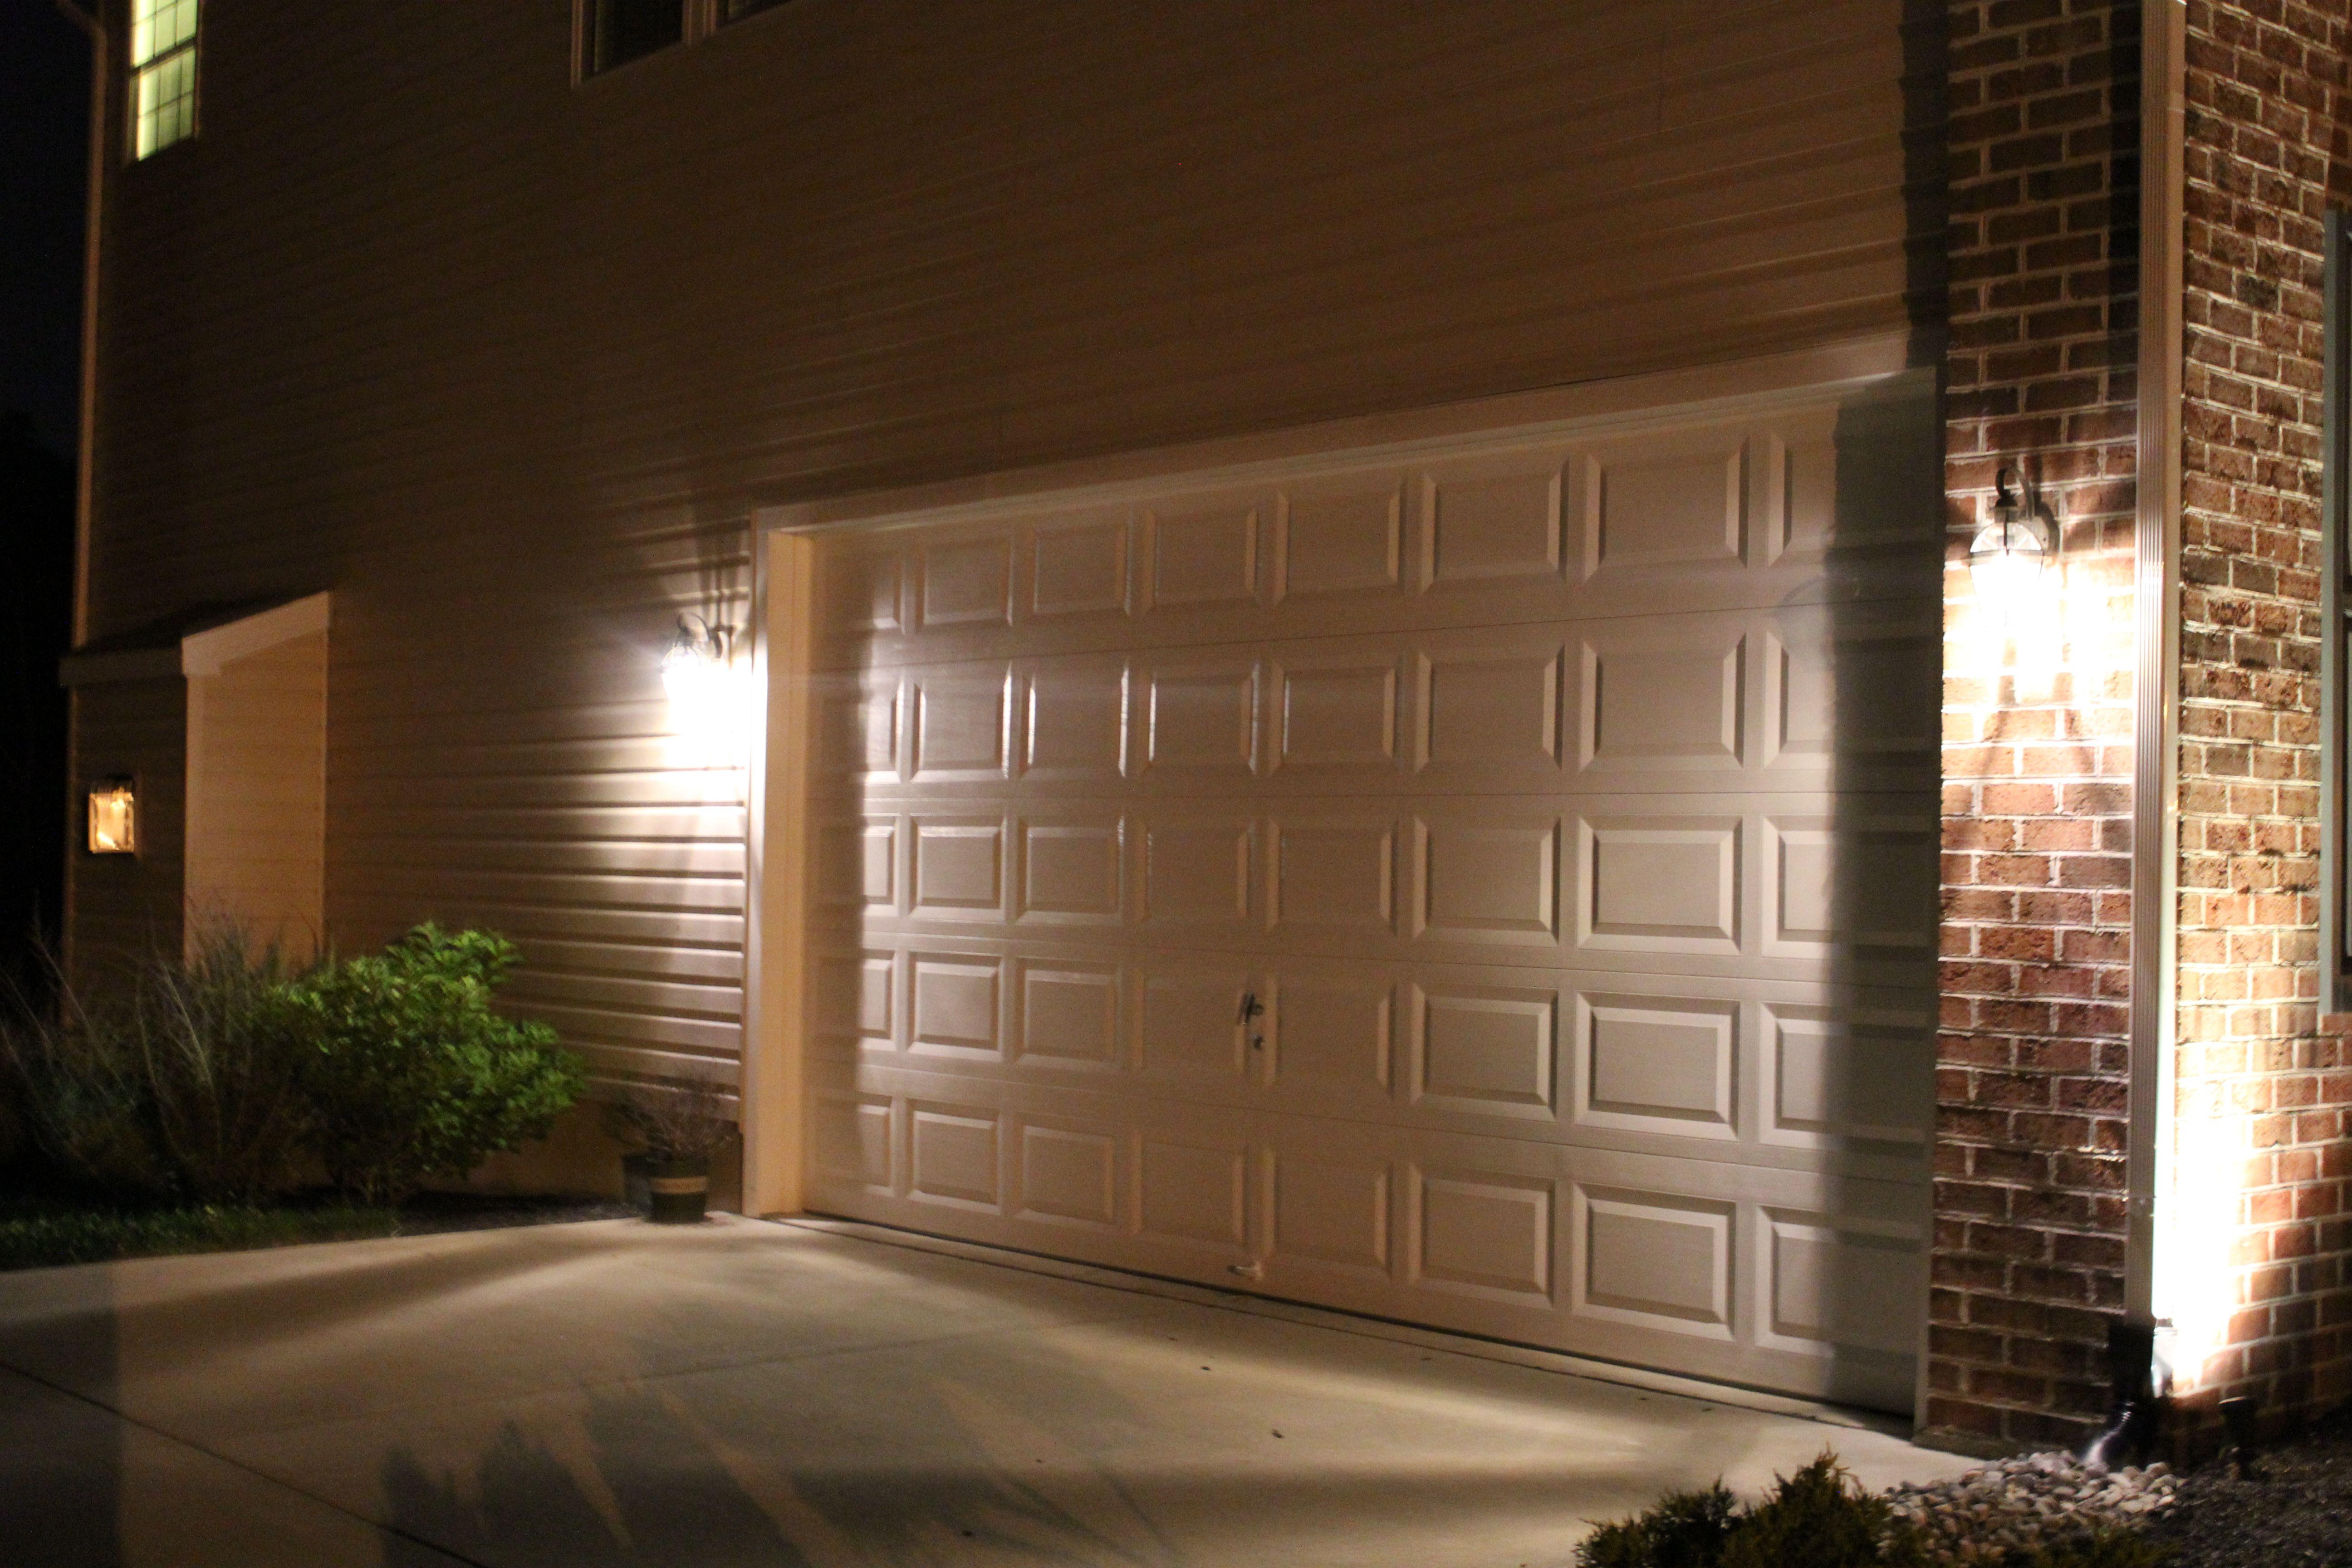 Garage Brick Wall Install Outdoor Light Garage Lighting Wall Lighting Design Outside Garage Lights